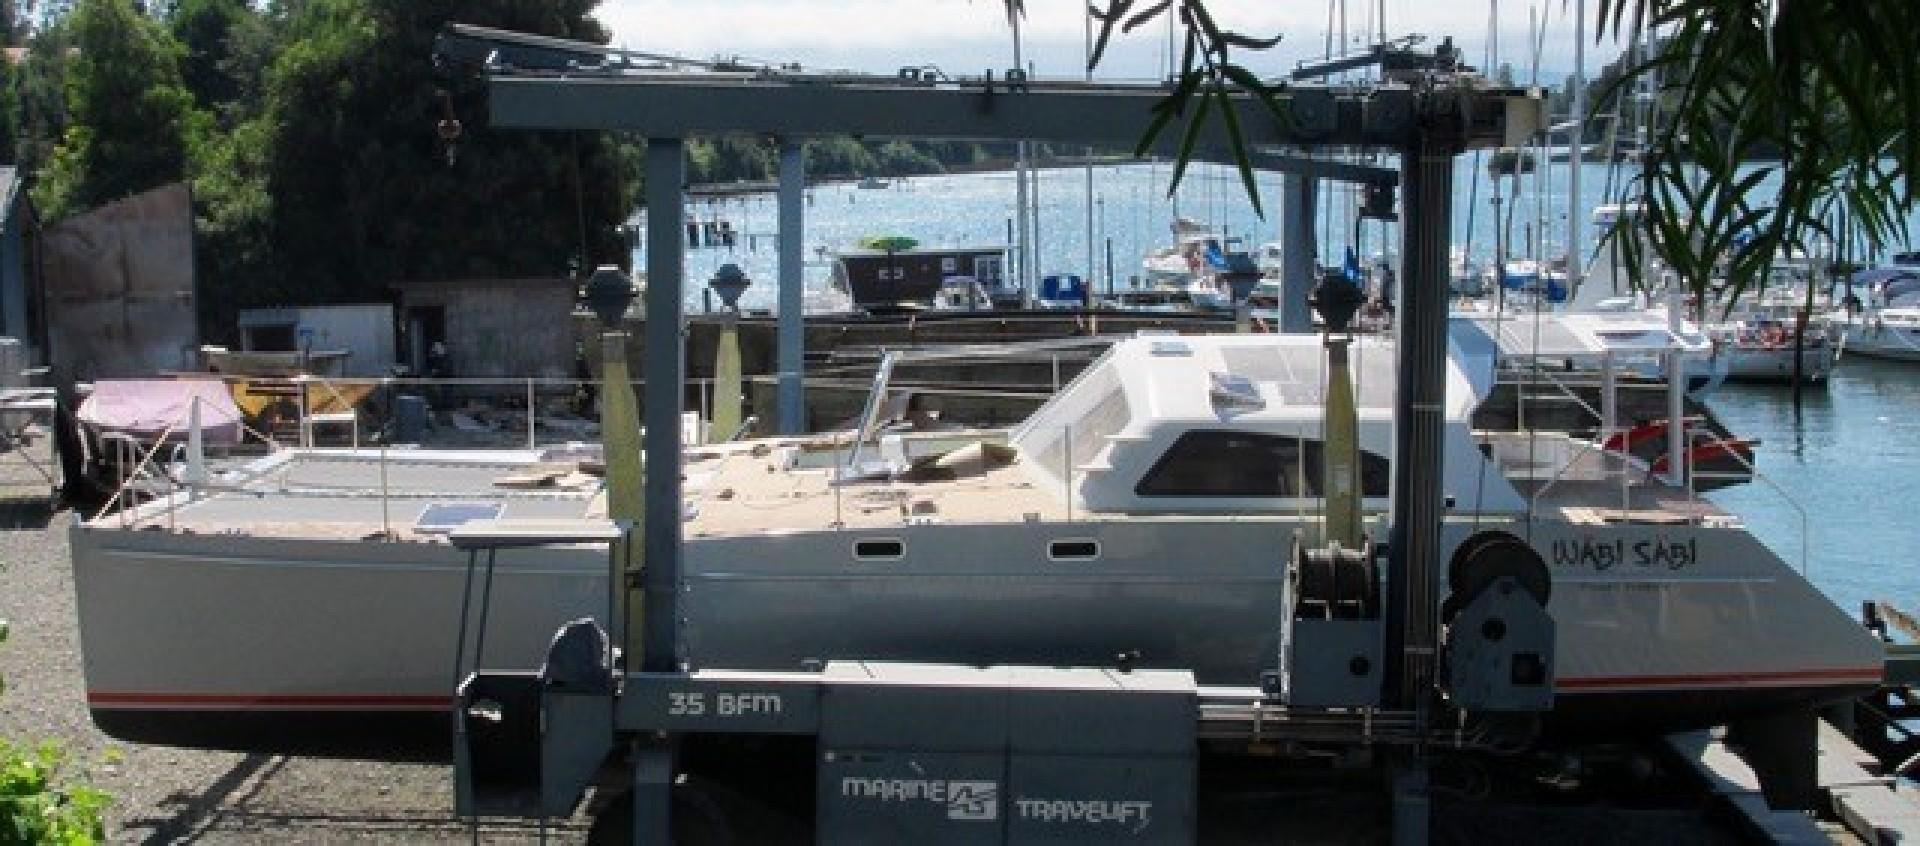 Atlantic-49 Catamaran 2018-Wabi Sabi Stuart-Florida-United States-1406861 | Thumbnail